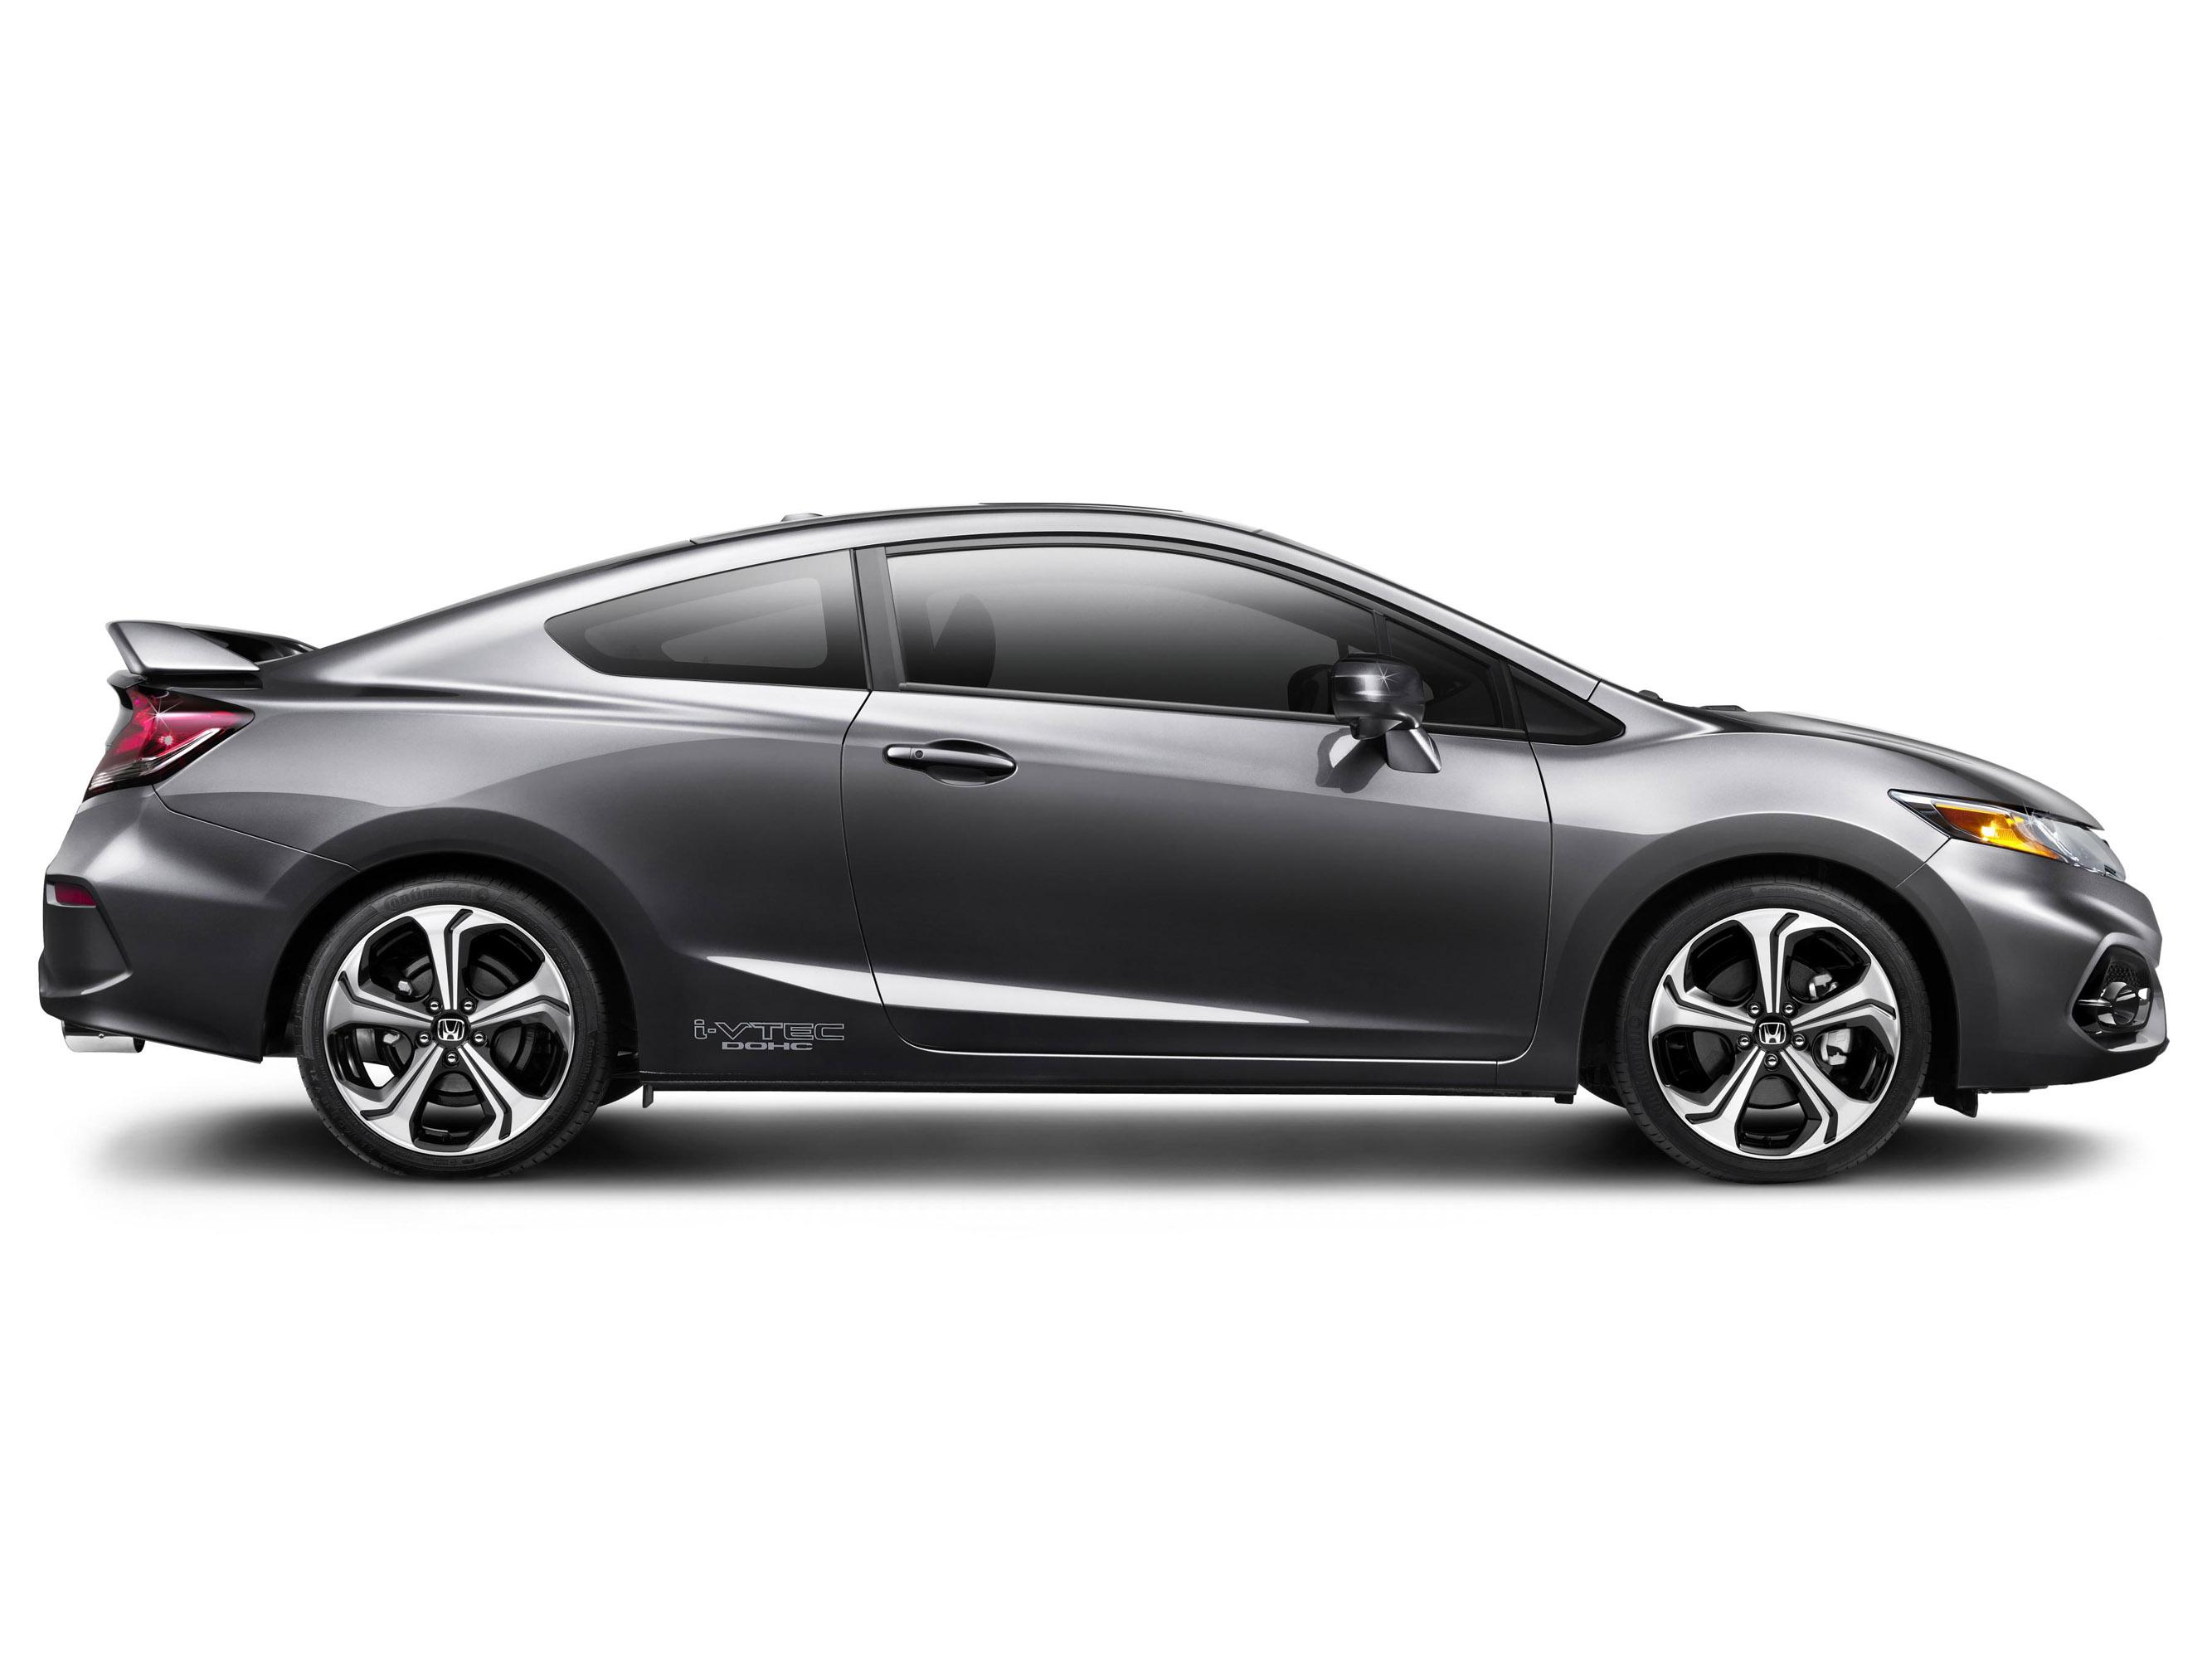 Honda Civic Coupe For Sale >> 2015 Honda Civic Si Coupe and Sedan Go on Sale